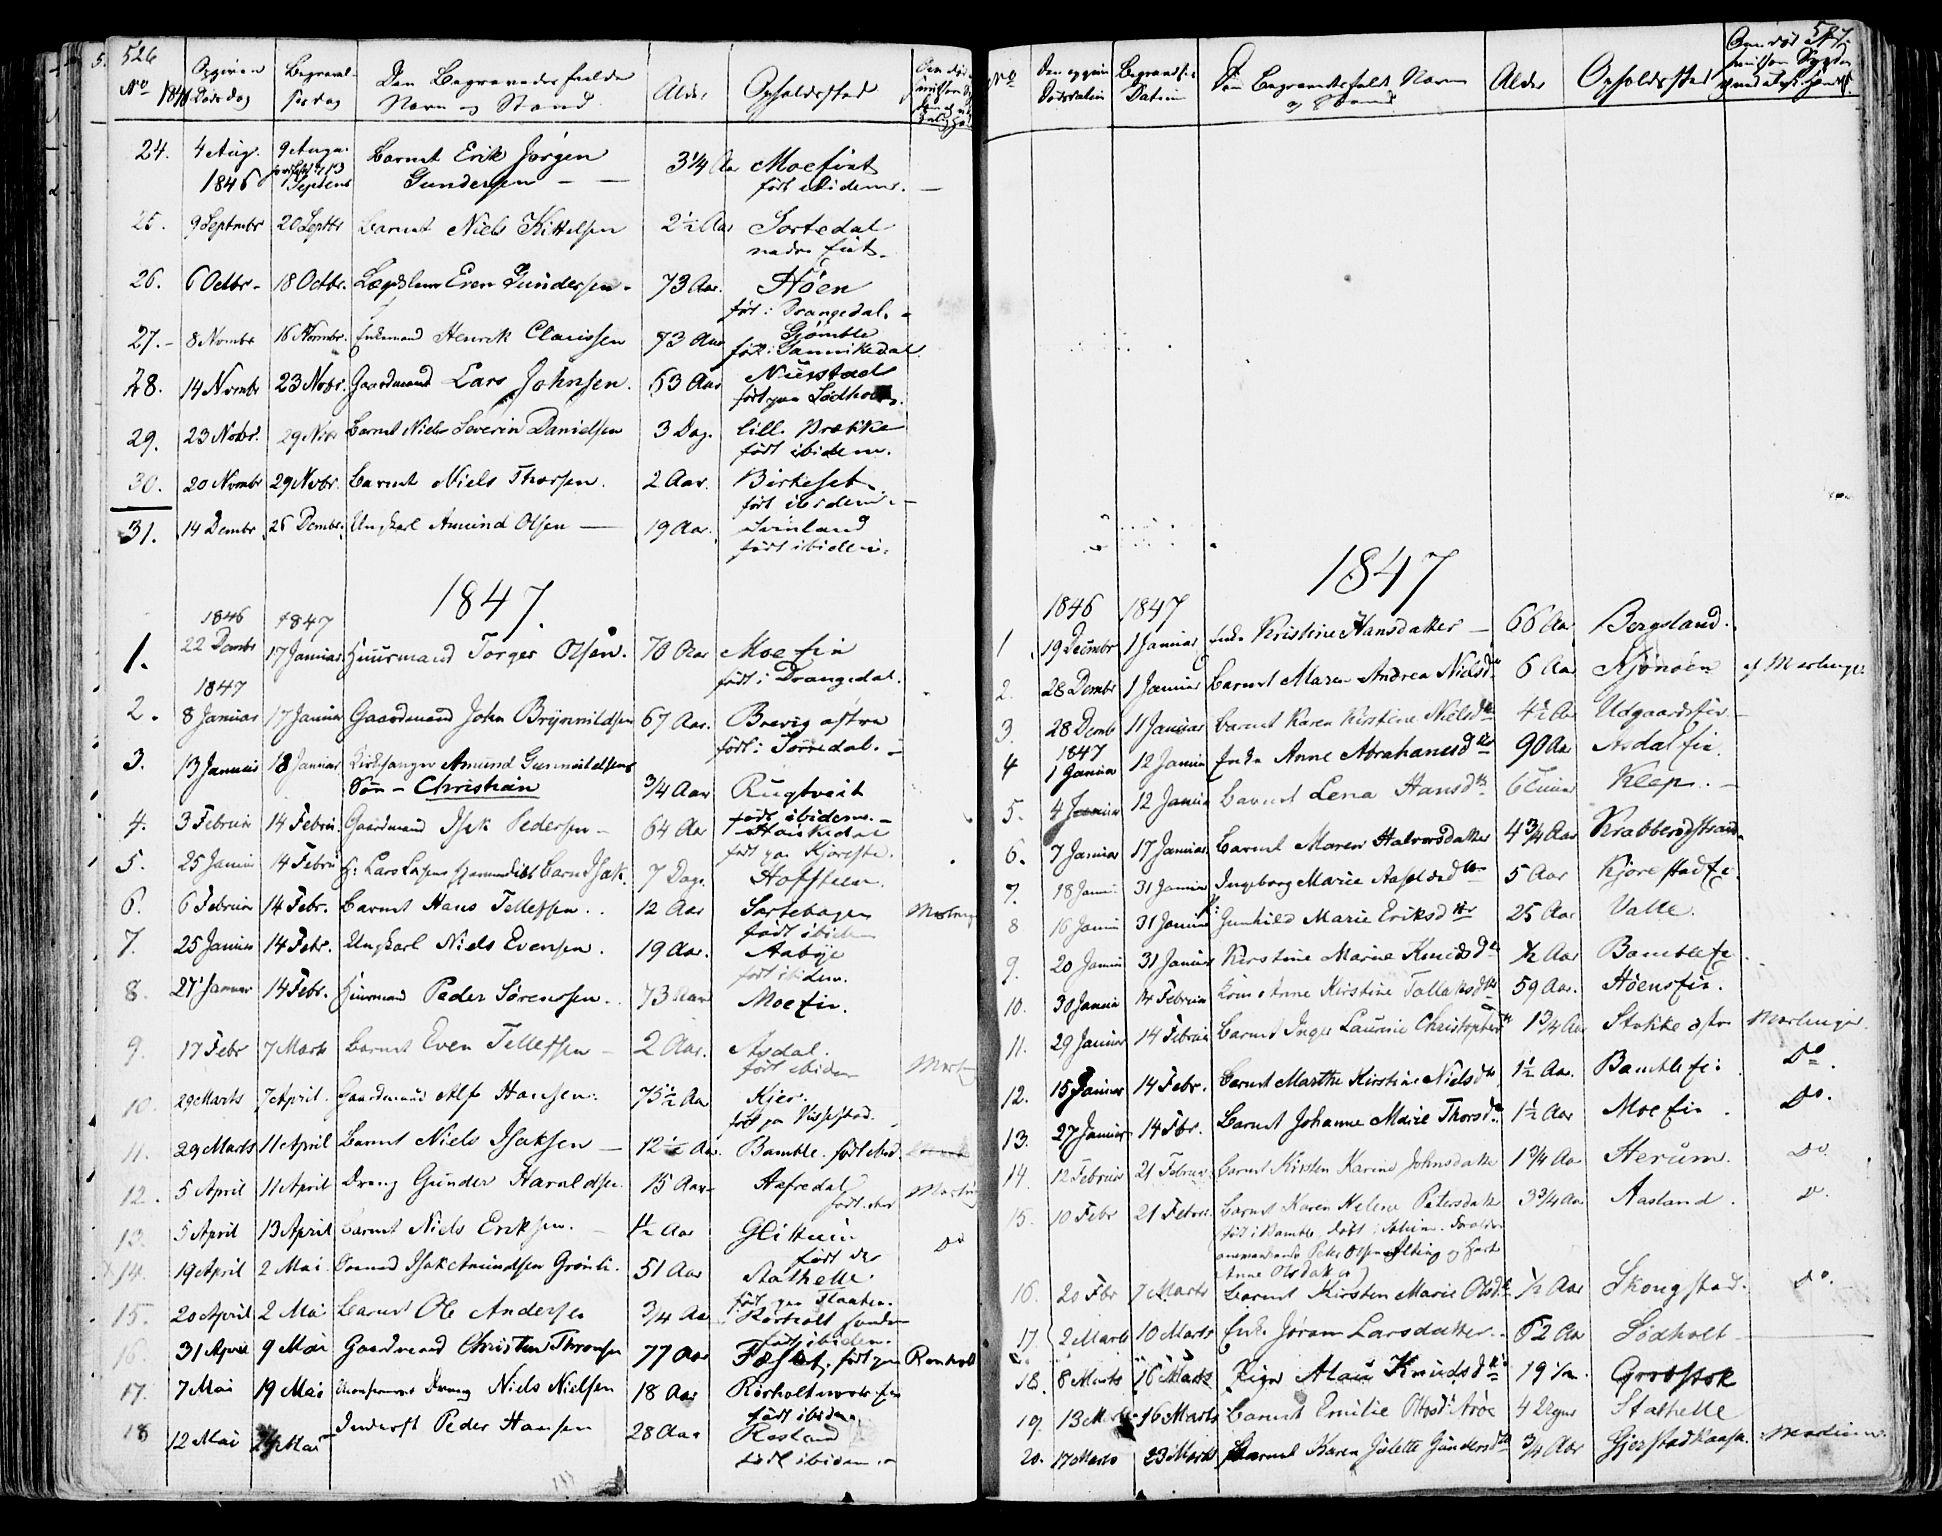 SAKO, Bamble kirkebøker, F/Fa/L0004: Ministerialbok nr. I 4, 1834-1853, s. 526-527